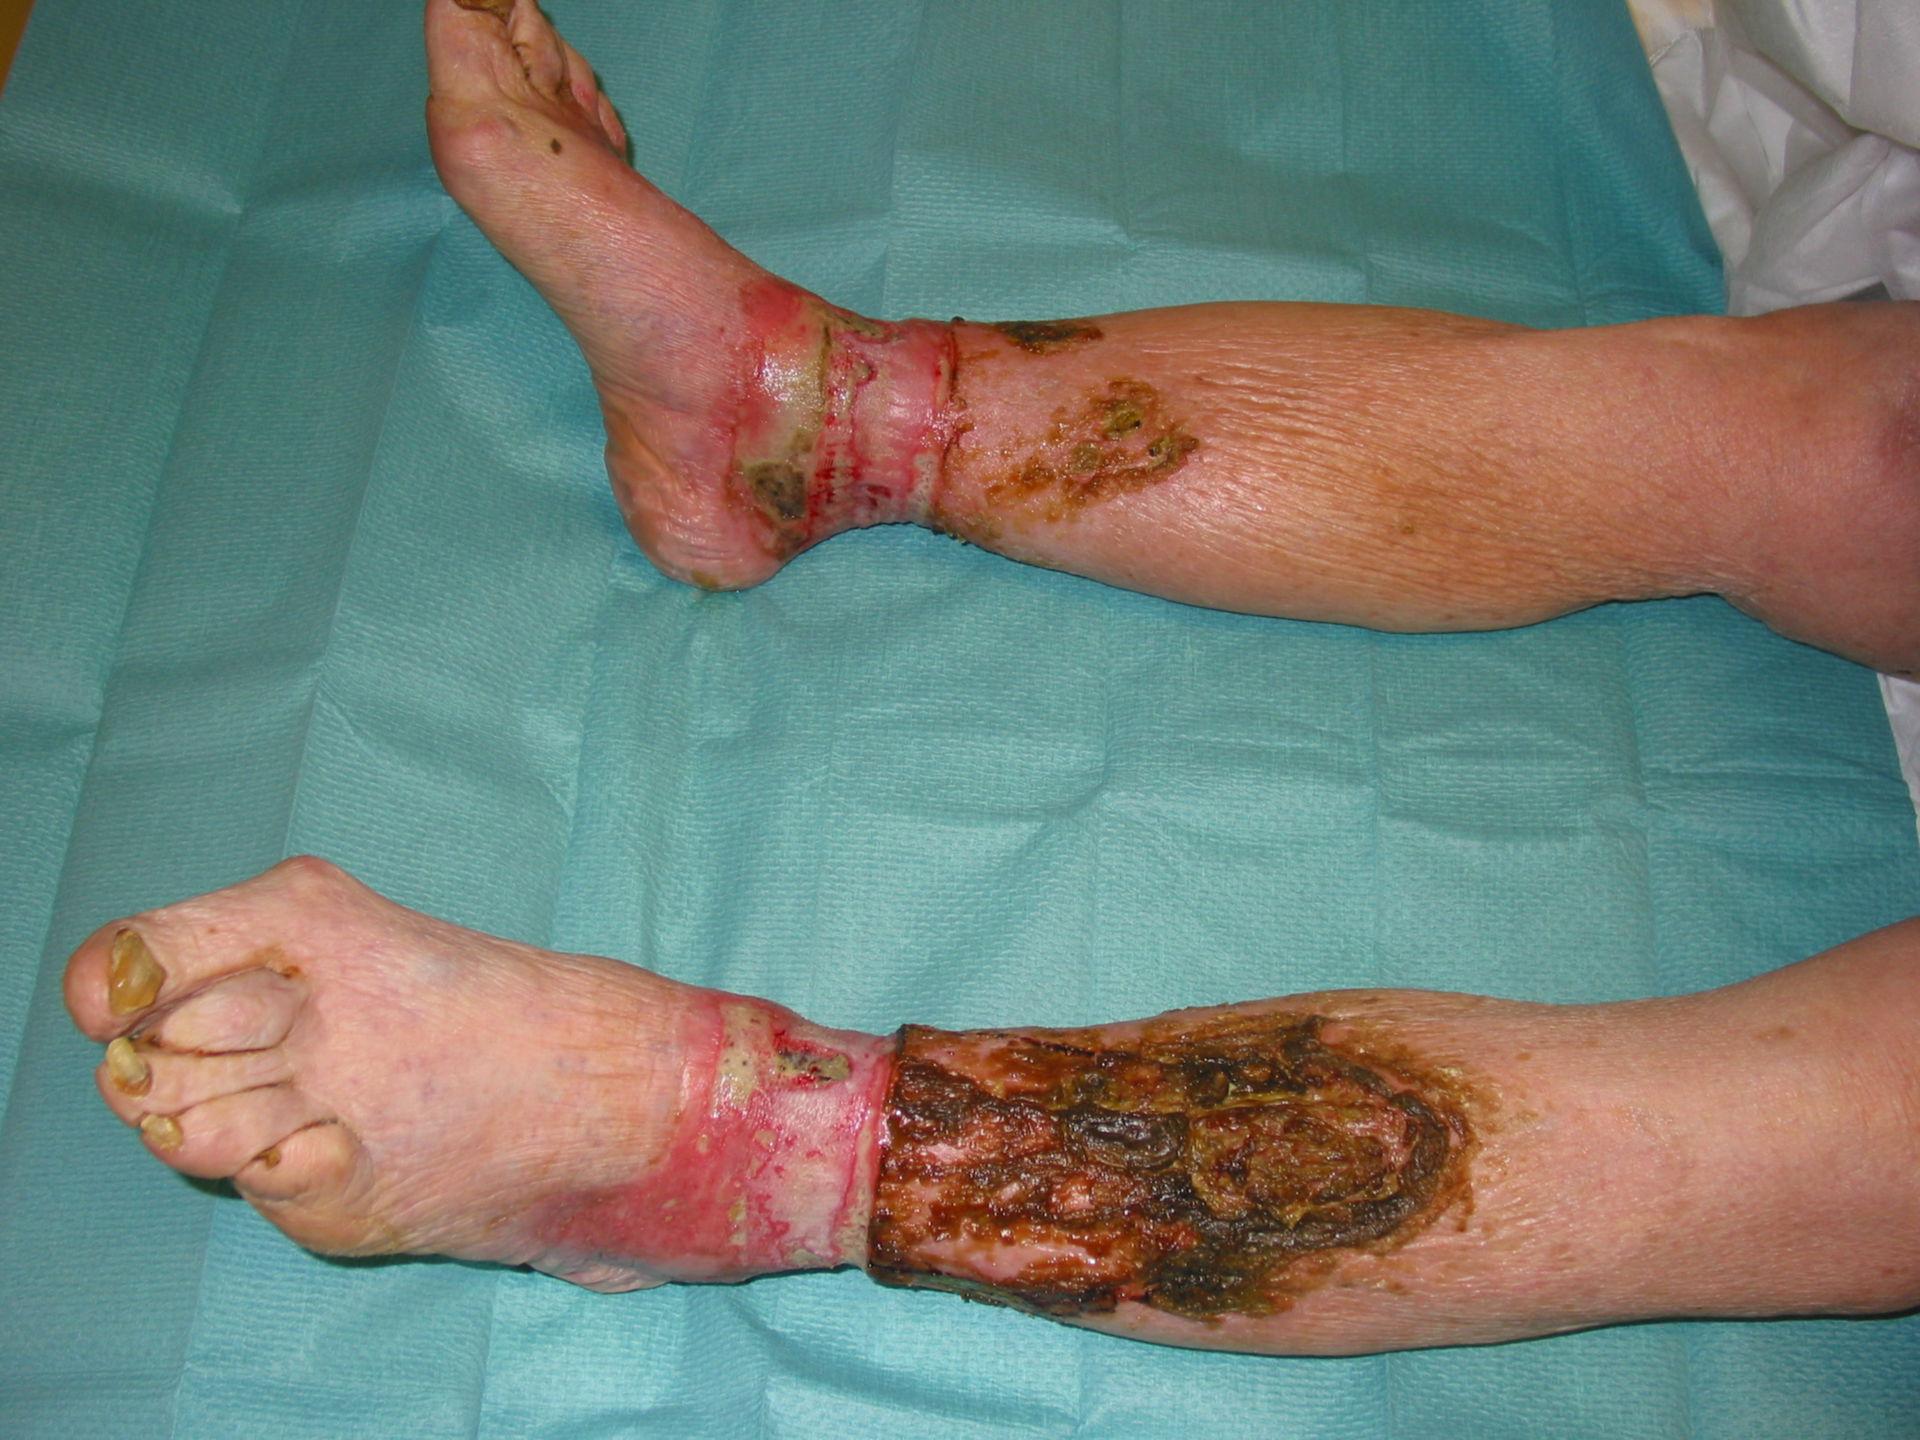 Ulcera venosa